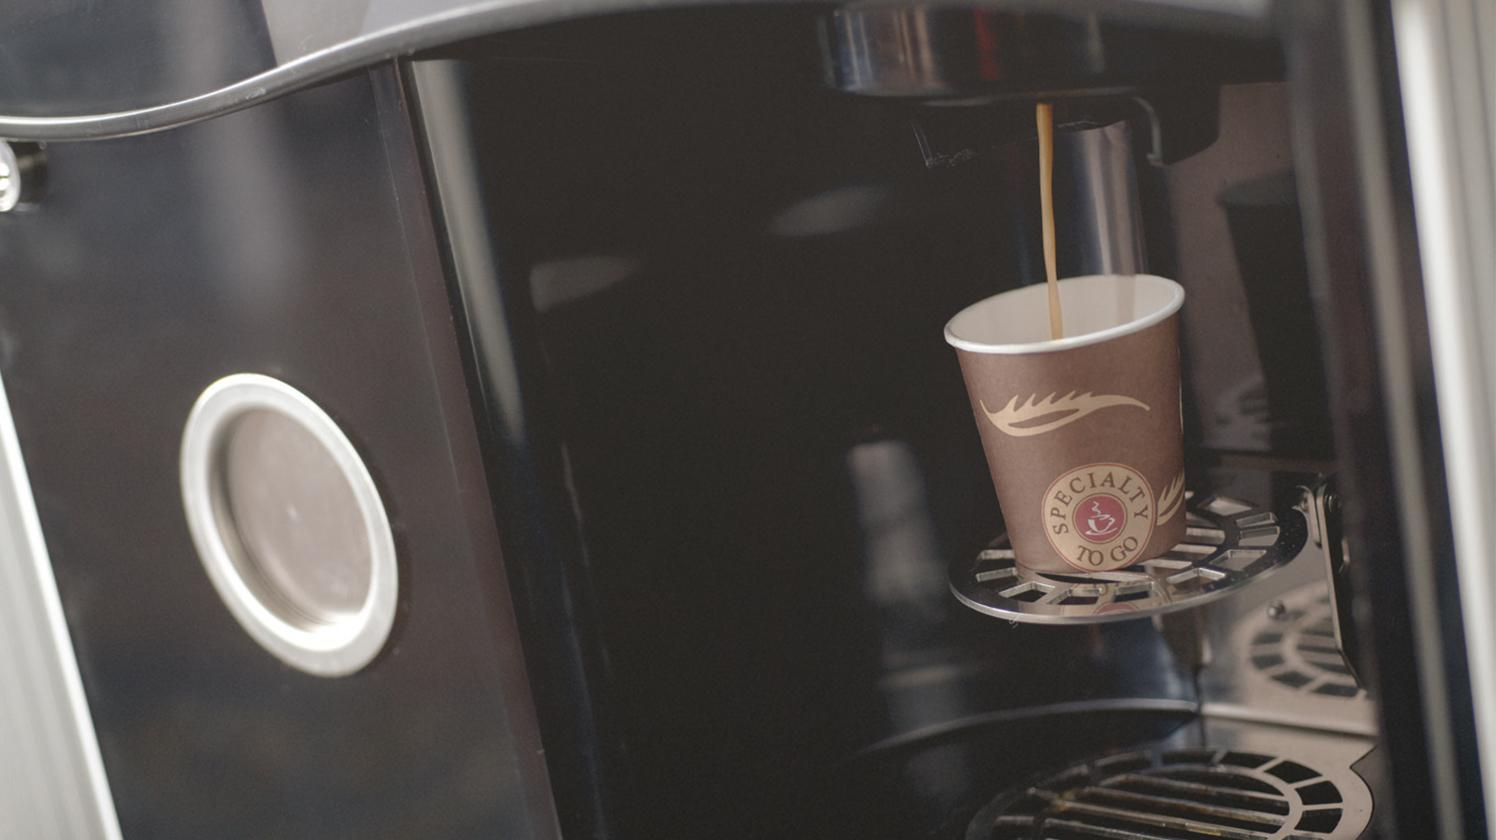 BRITA water vending machine coffee machine